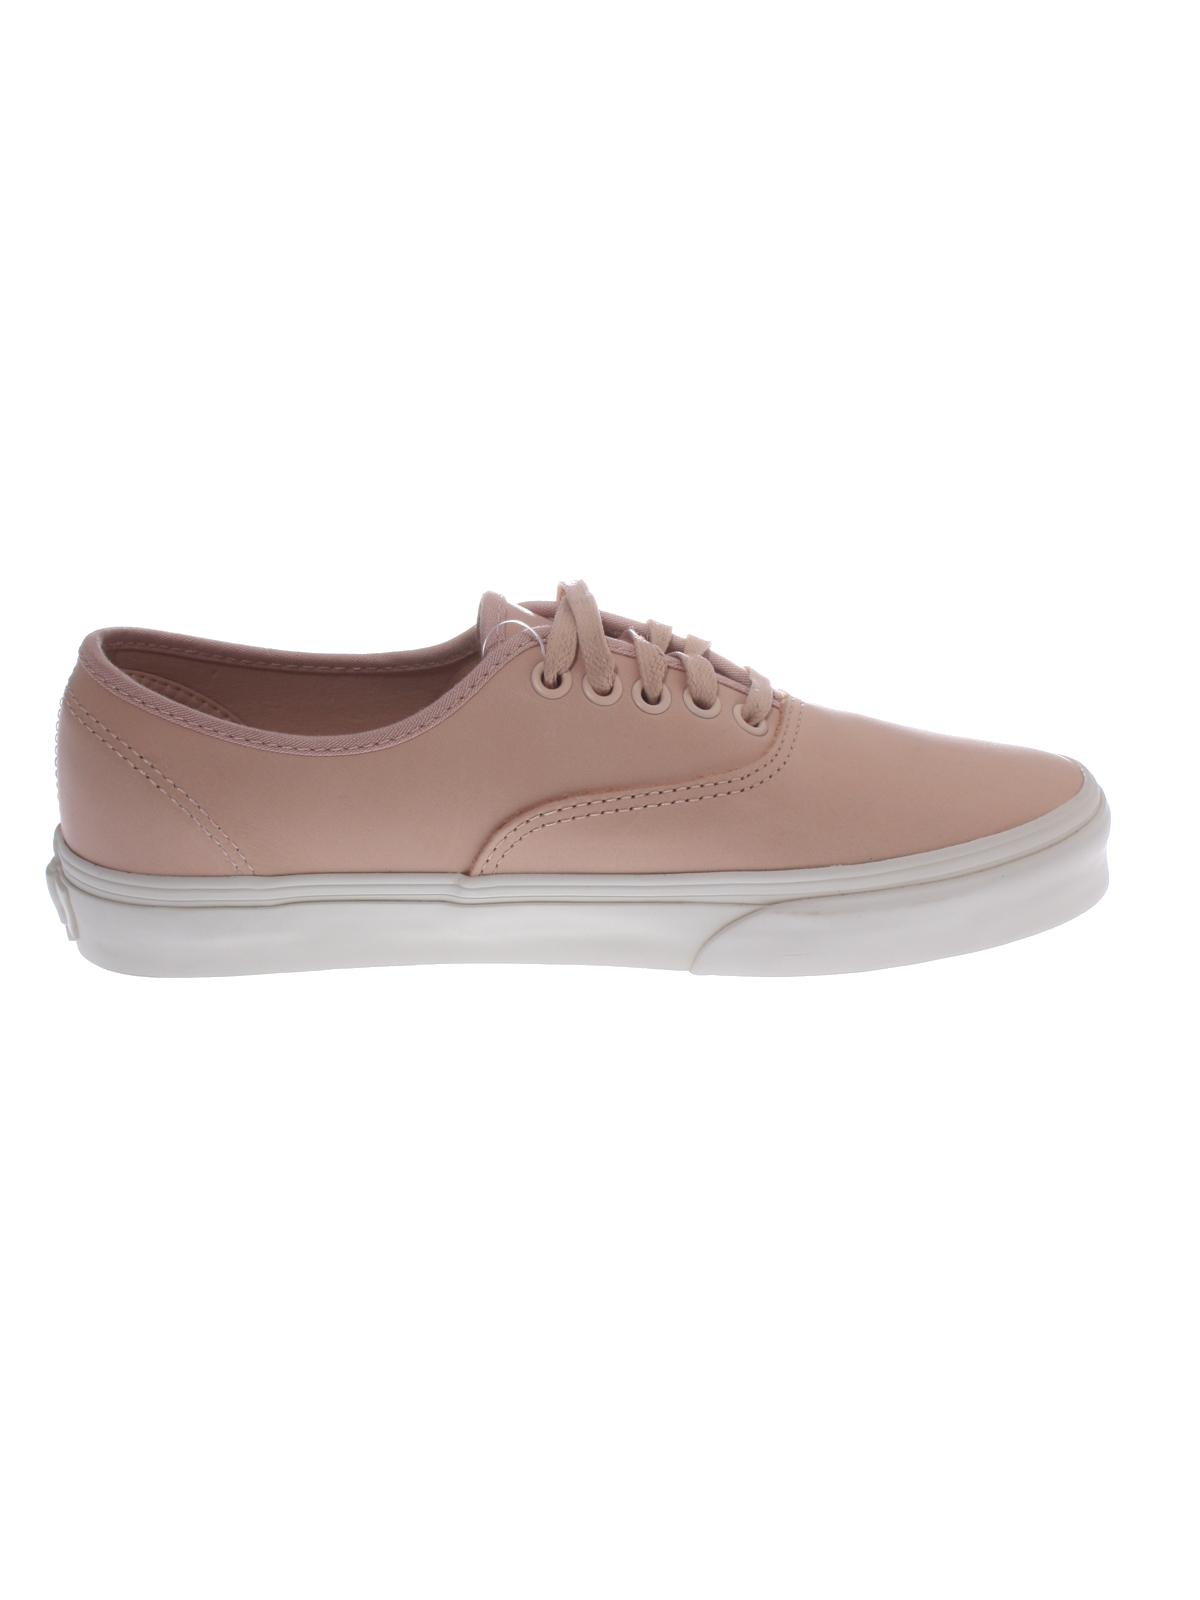 6cbddfe01a9a52 Vans Authentic Dx Unisex Sneaker Schuhe rosa (tan) VA327KLUI Damen ...